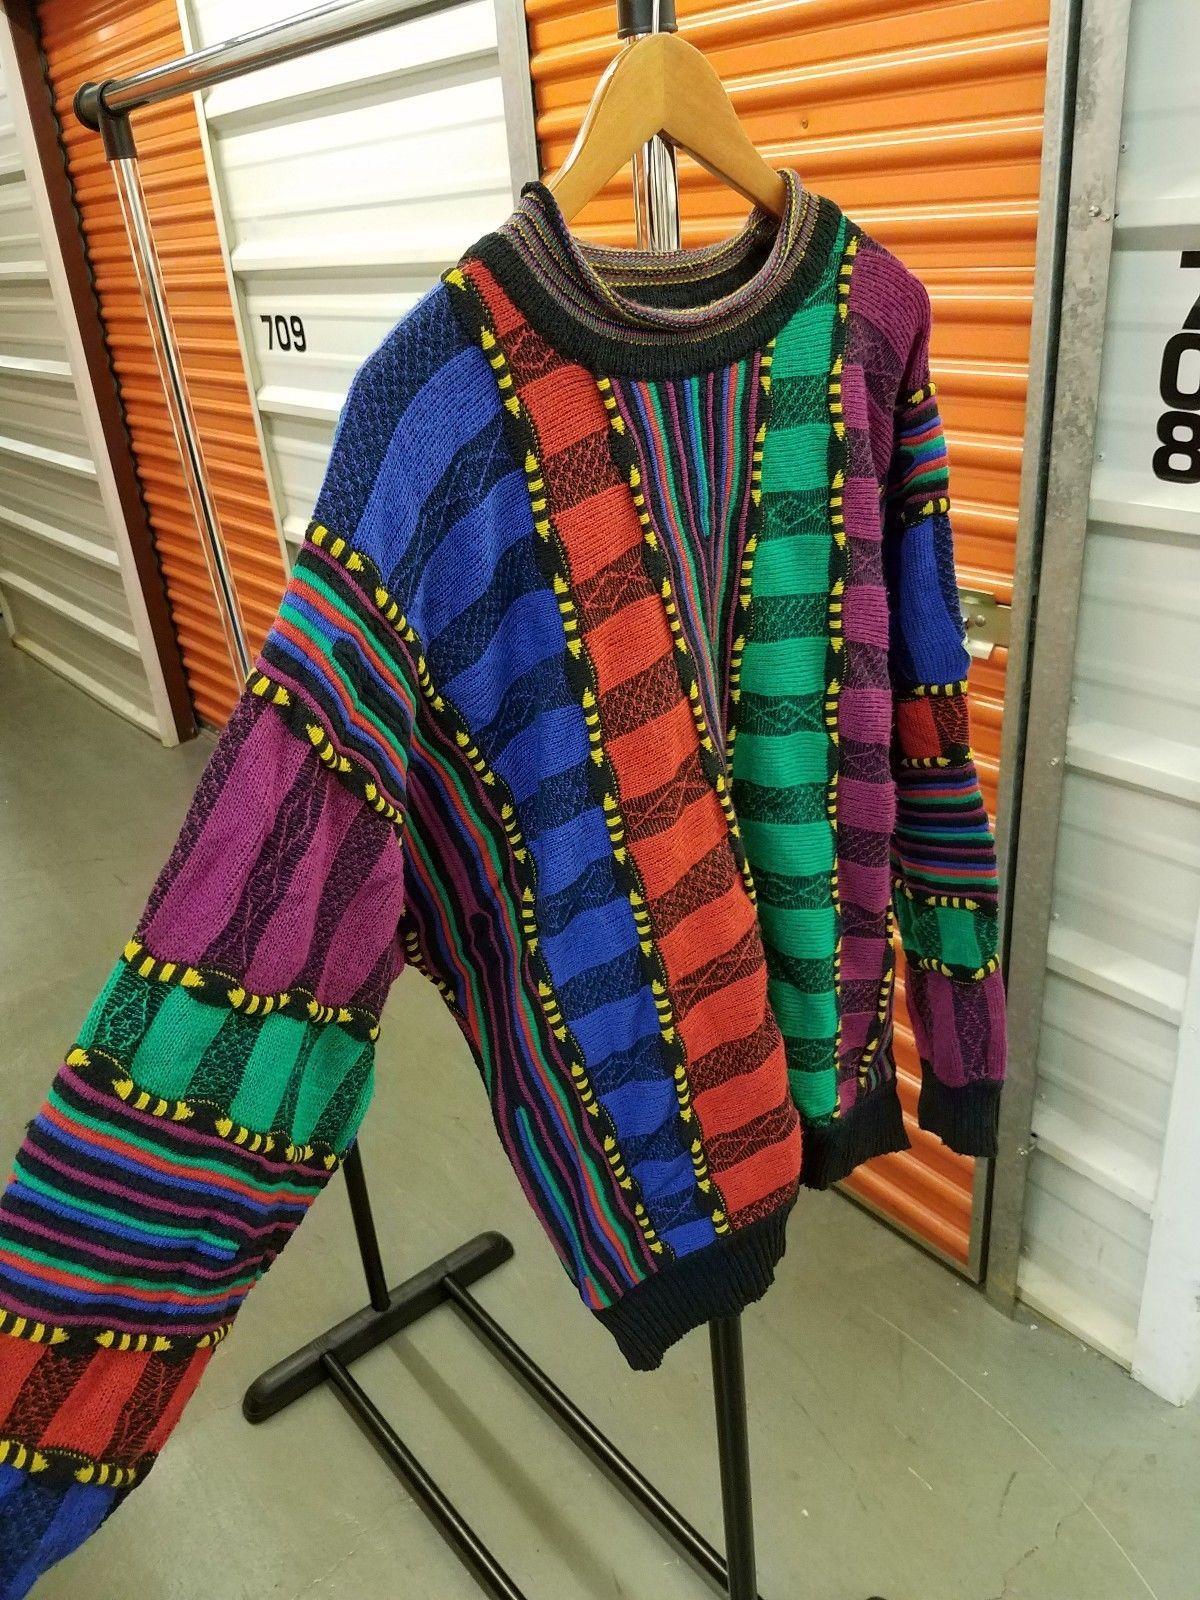 beef61cf31e Vintage Carlo Colucci Sweater 90 s Biggie Hip Hop Coogi Style LG Australia  Cosby